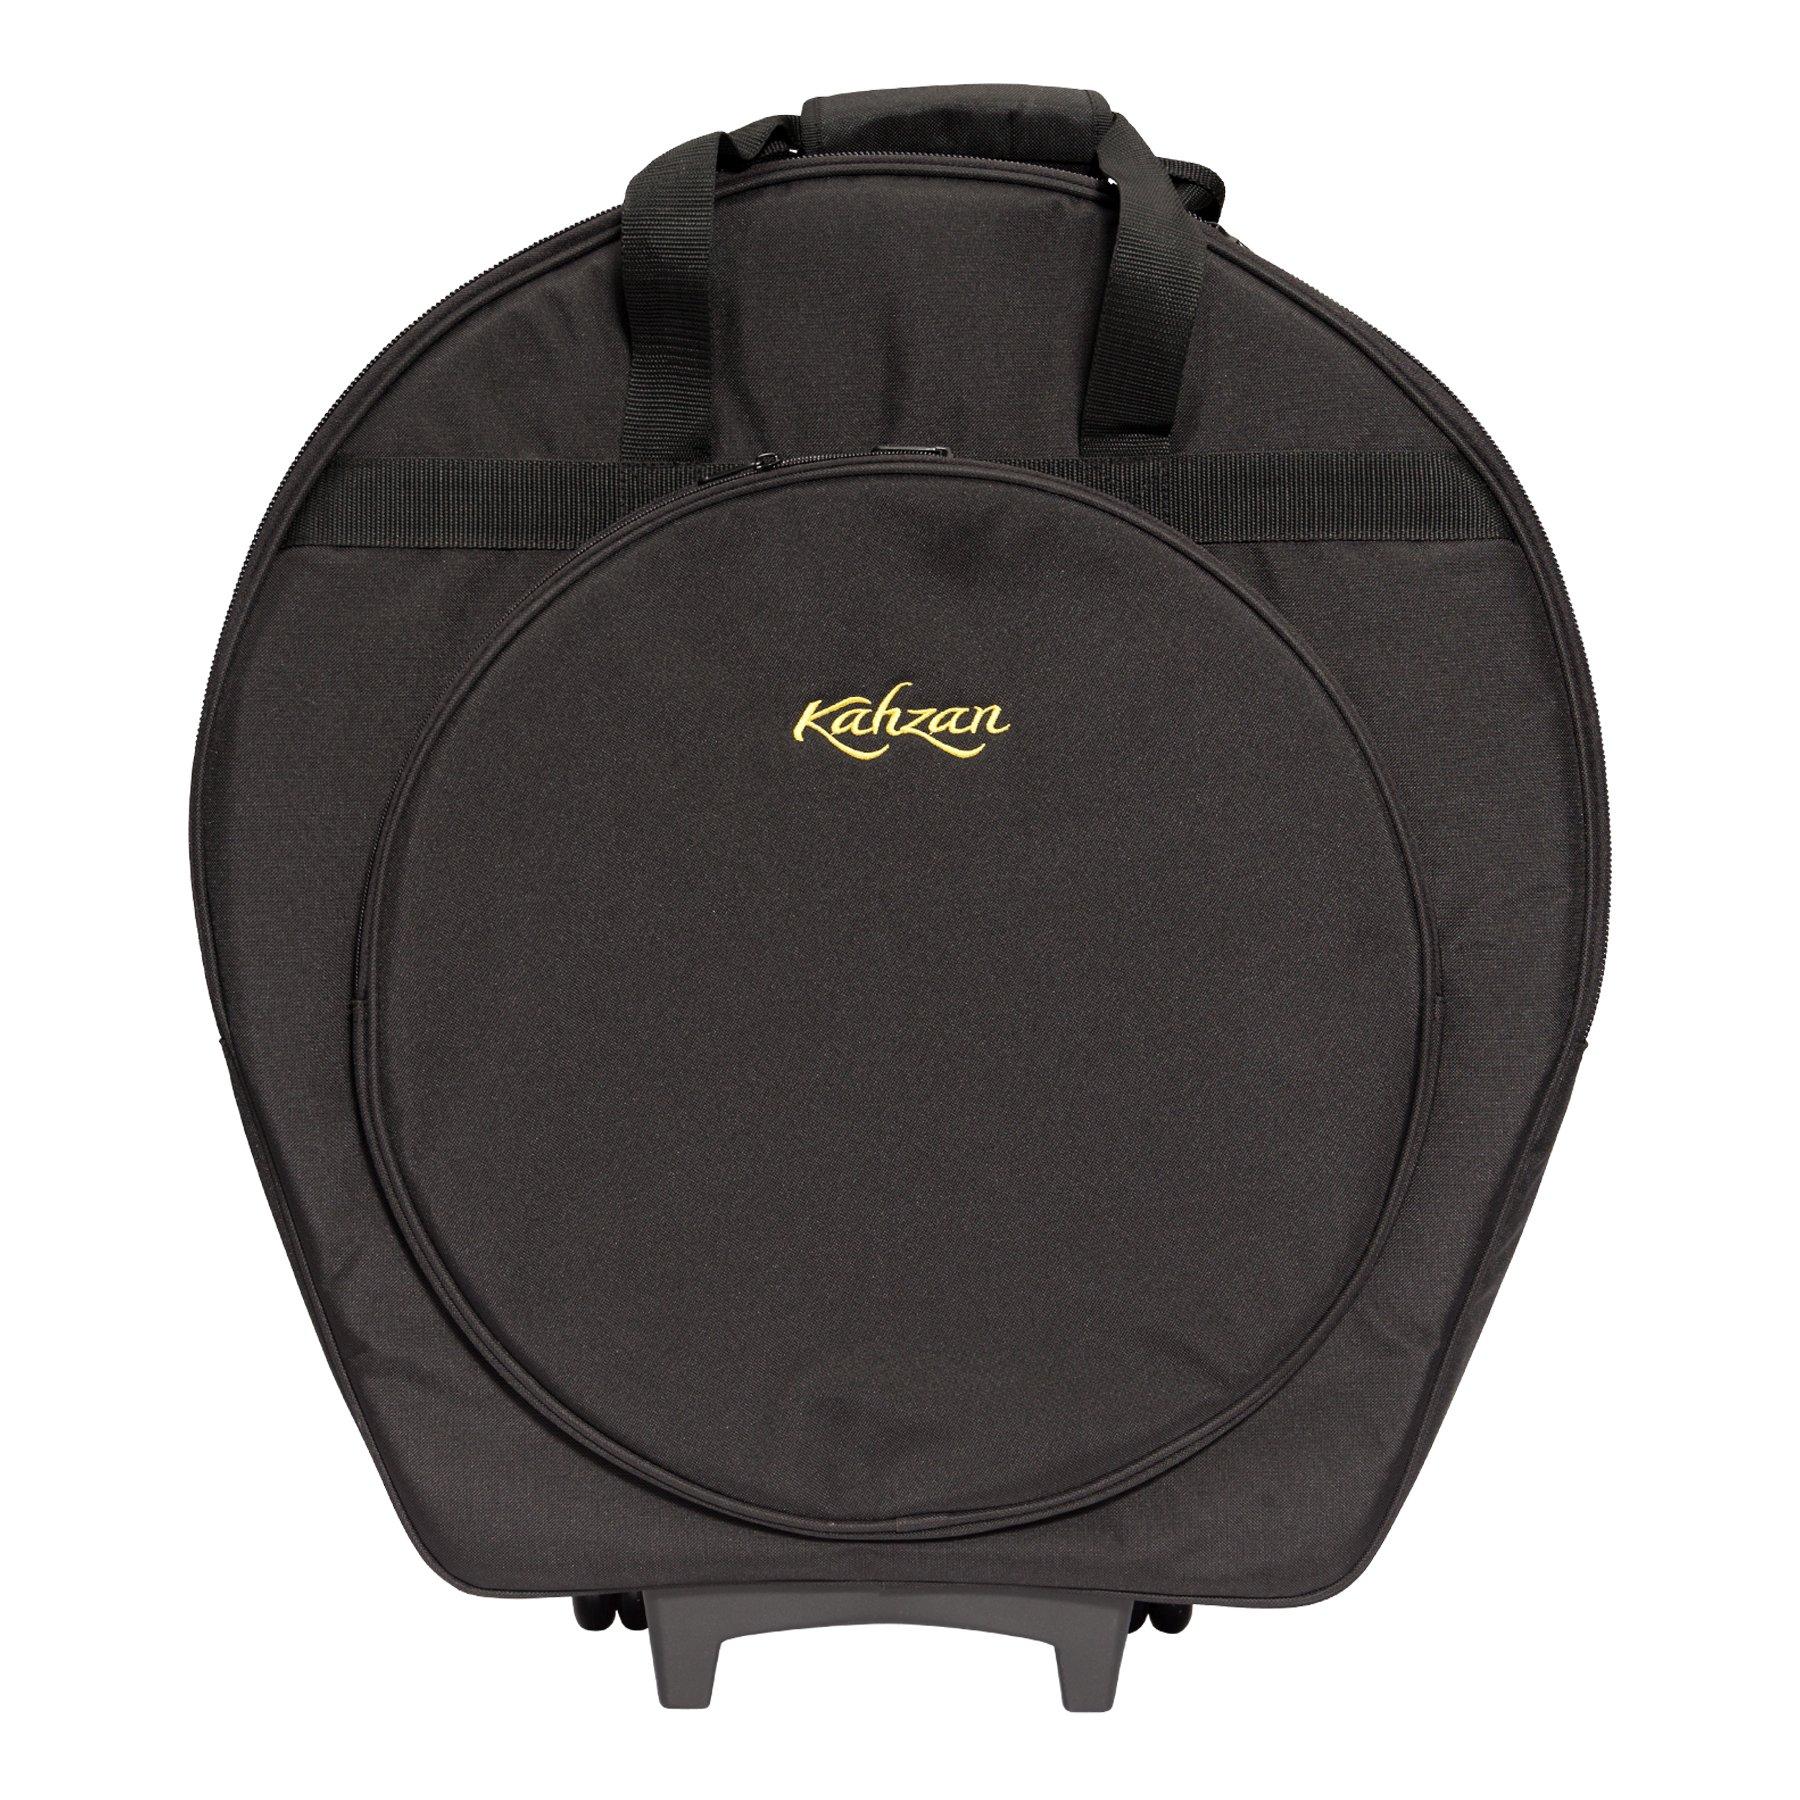 KZ CBAG5 BLK 1 - Kahzan Deluxe Cymbal Trolley Bag (Black)